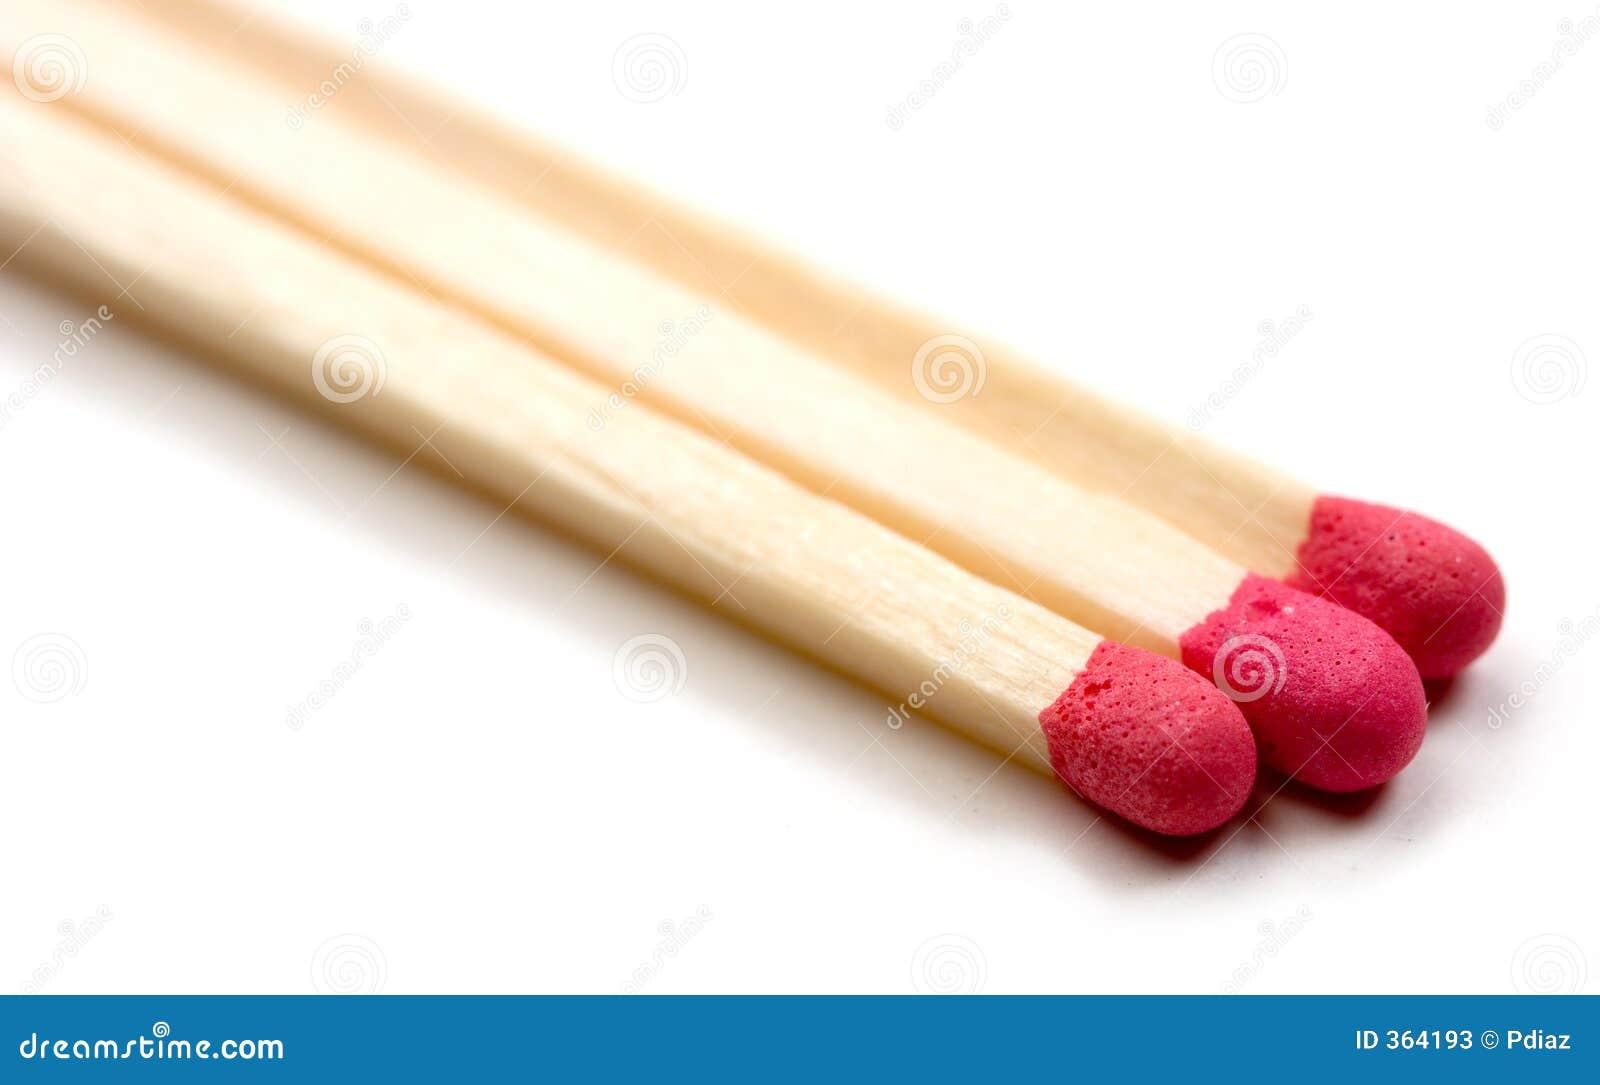 how to make phosphorus matches